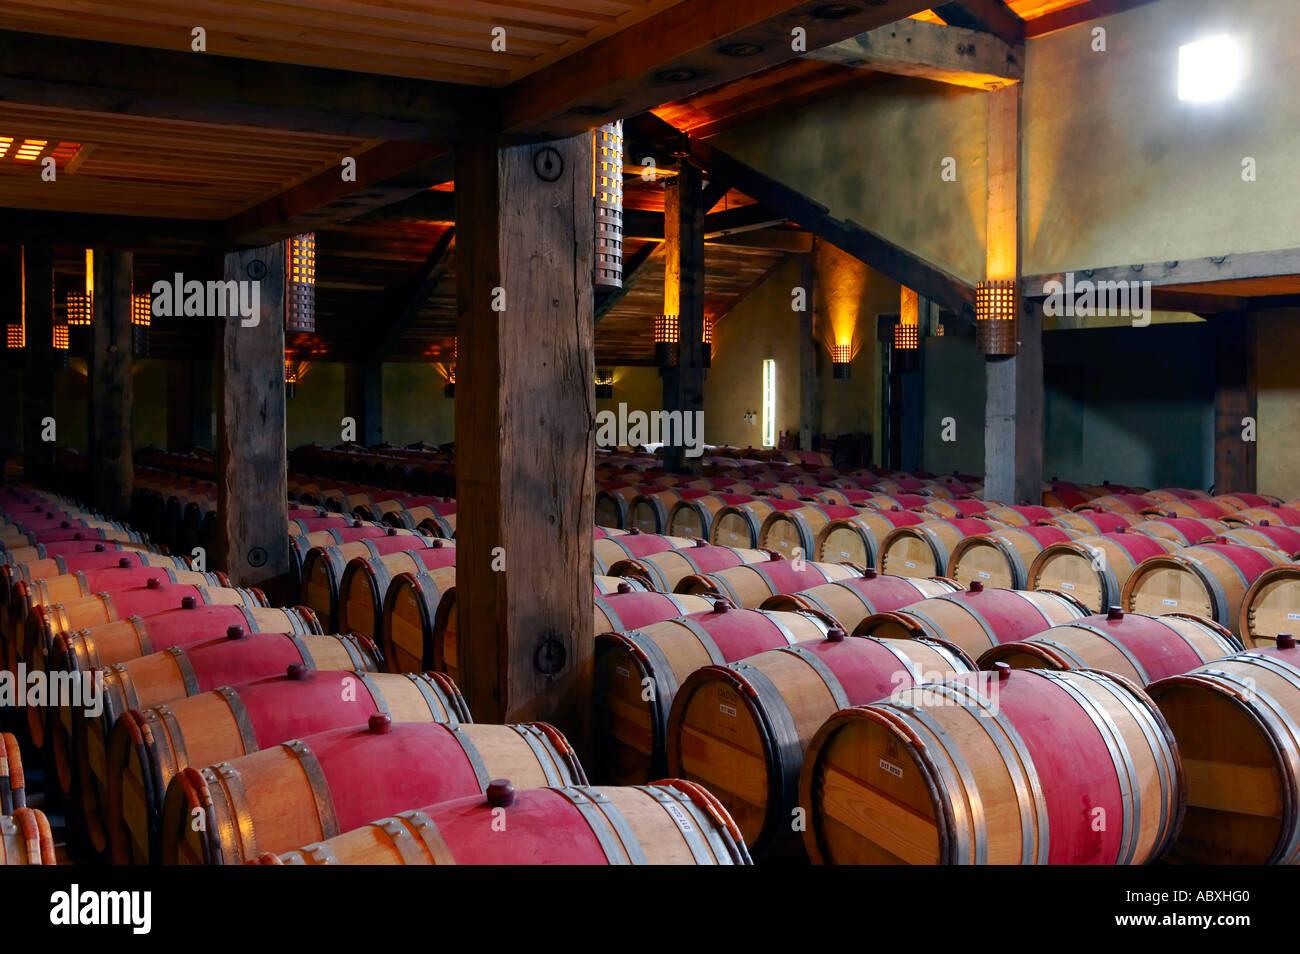 Tom Mcdonald Cellar At Church Road Winery Taradale Hawkes Bay New Zealand Stock Image